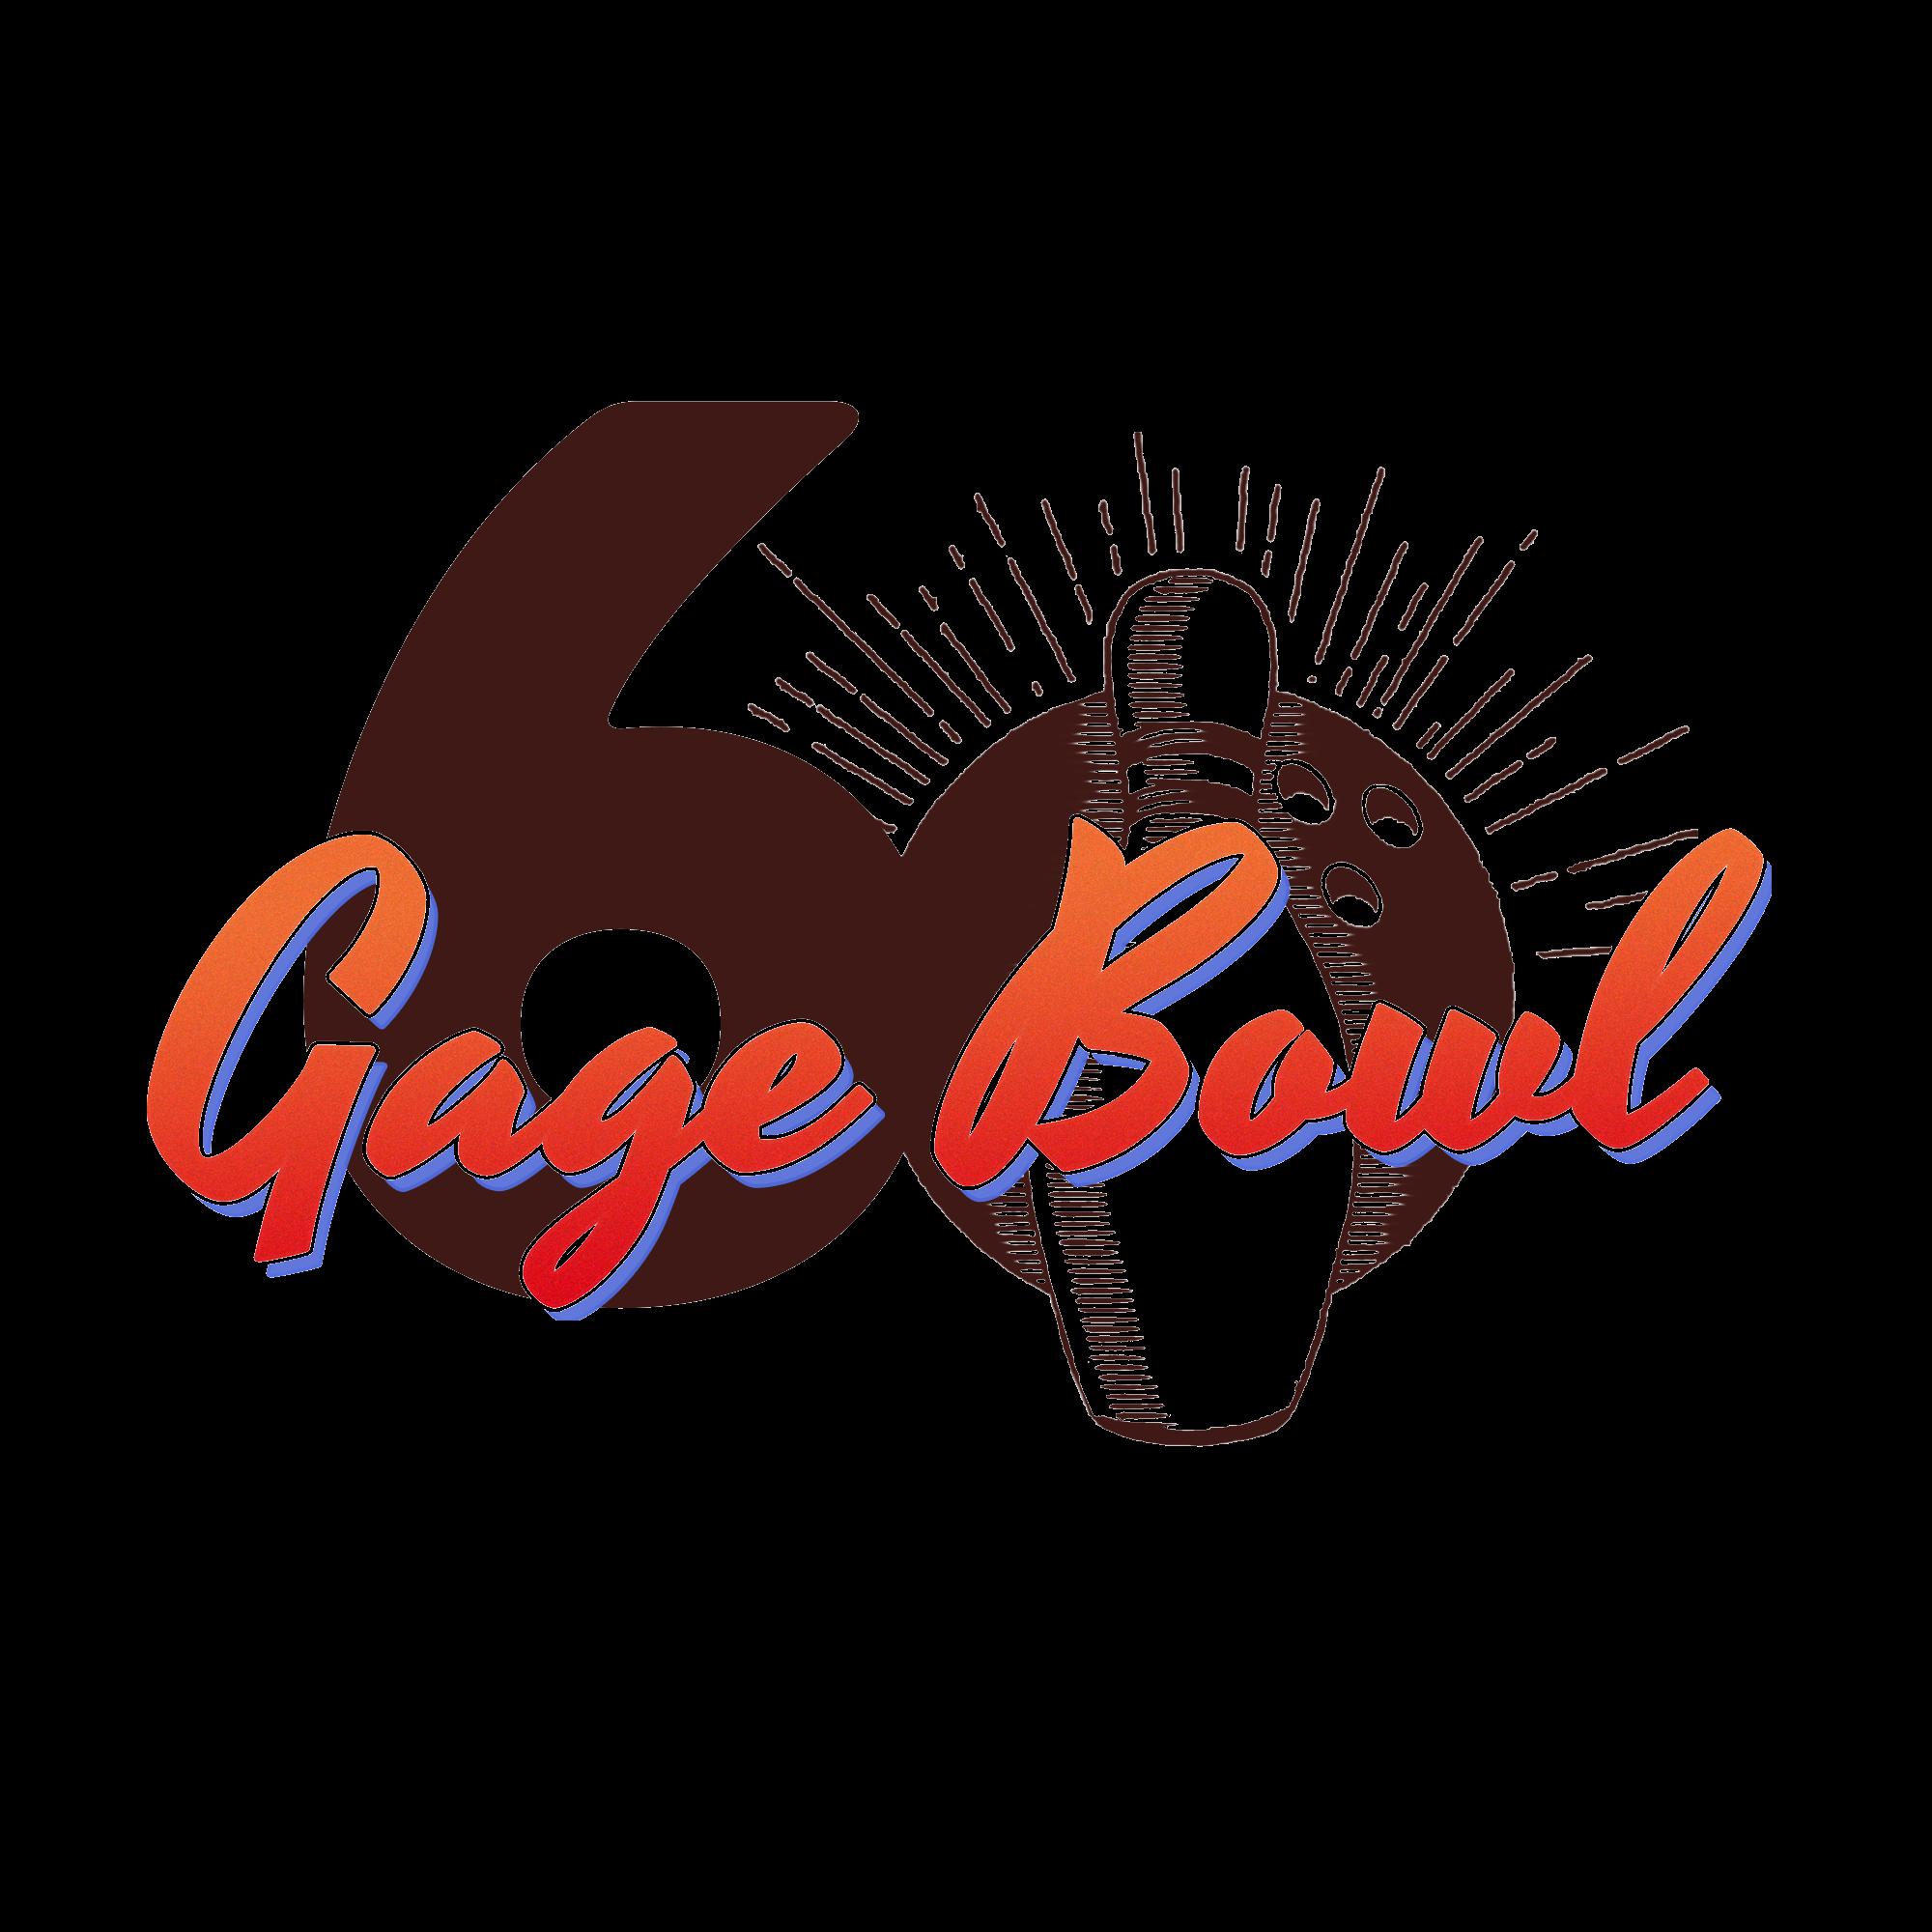 gagebowl